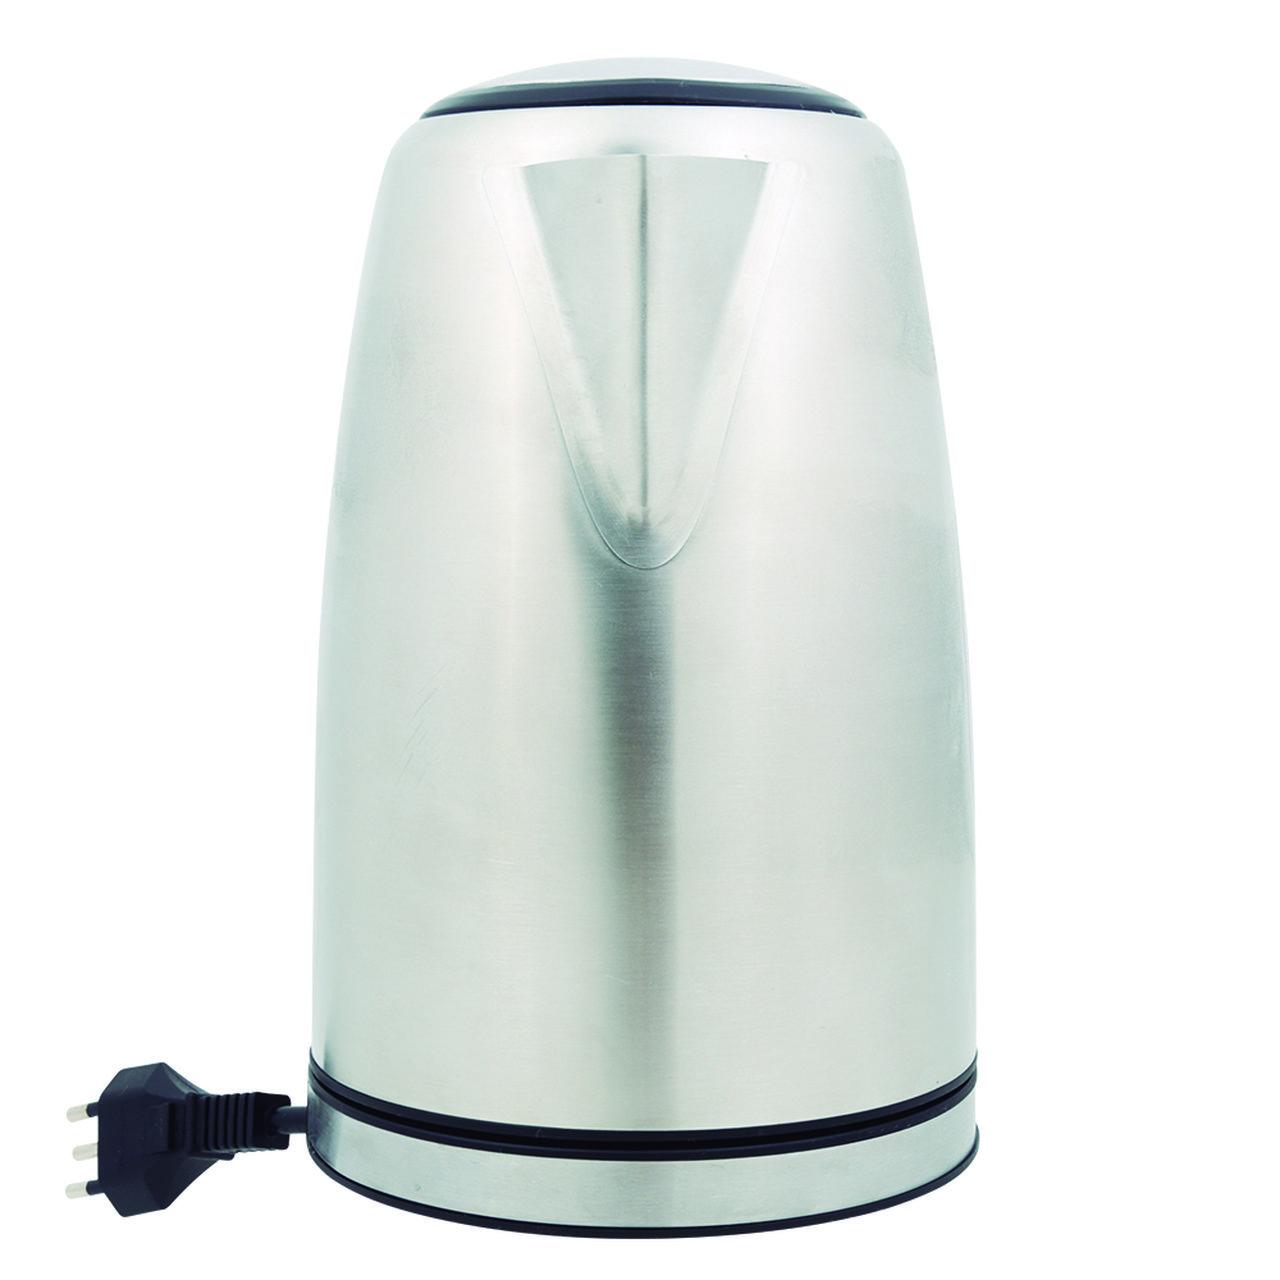 Jarra Elétrica Calore 1,7 Litros Inox 220V - MOR 7726